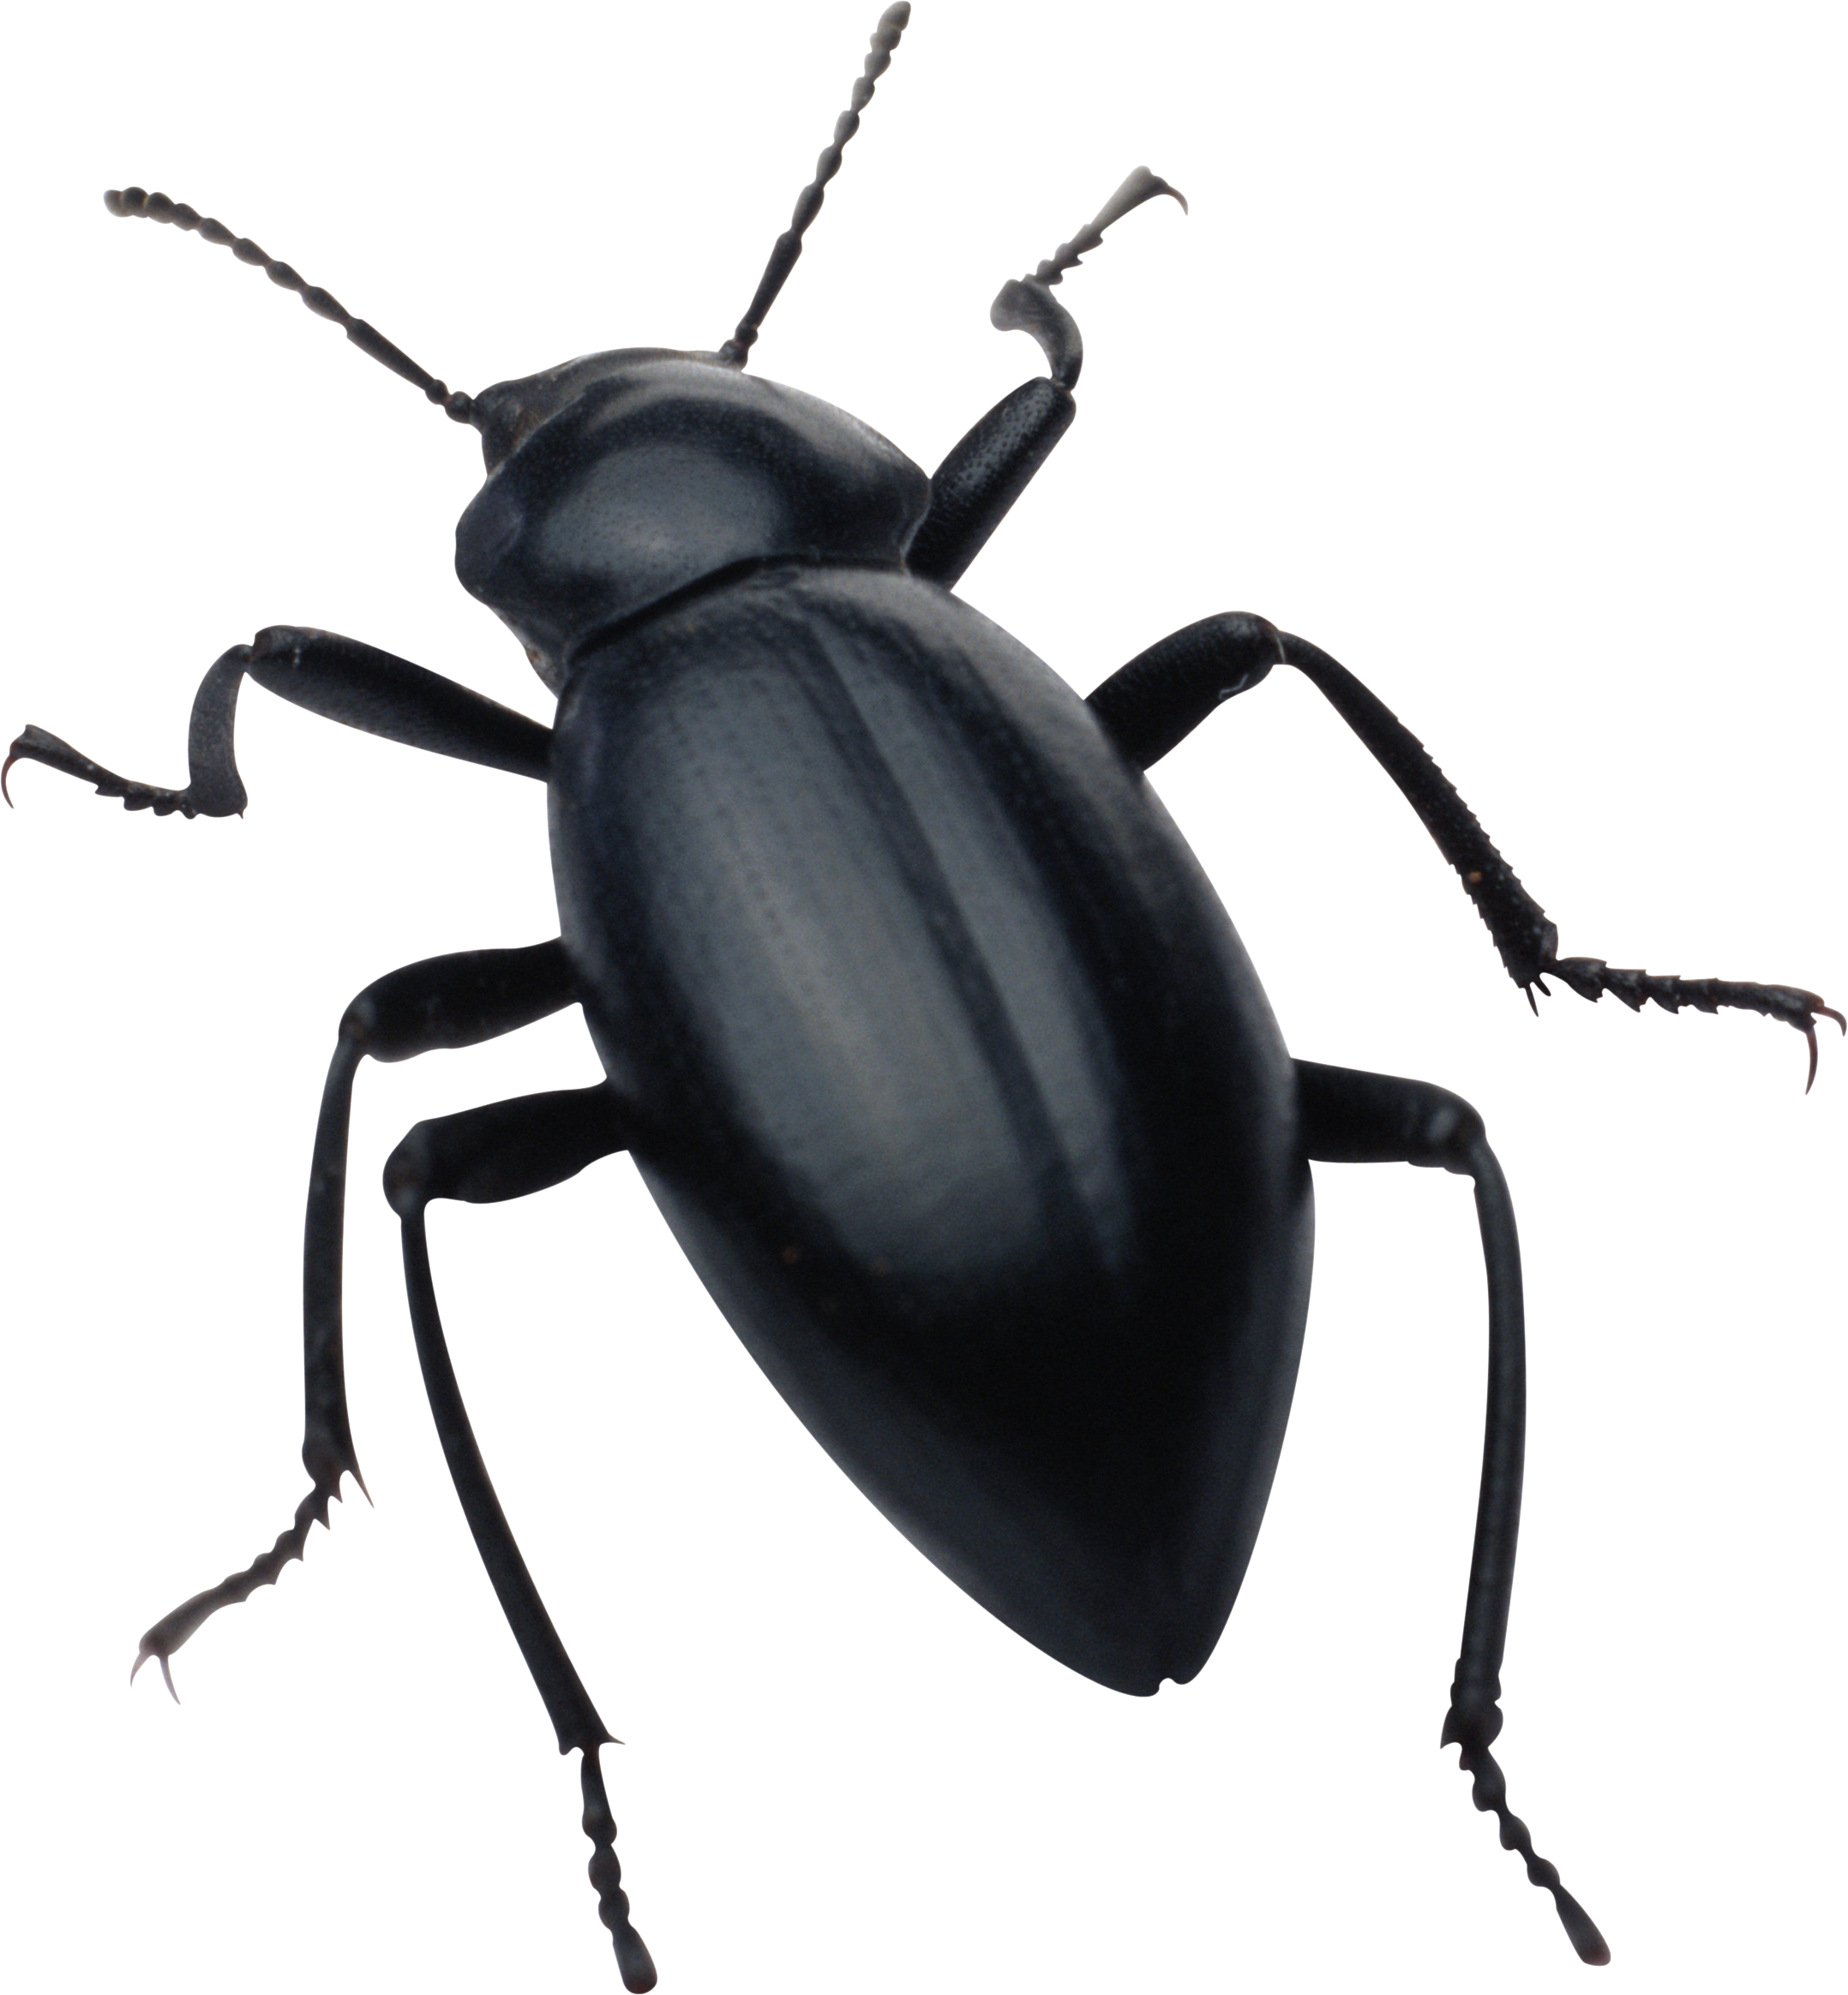 Black Bug Png Image - Bugs, Transparent background PNG HD thumbnail